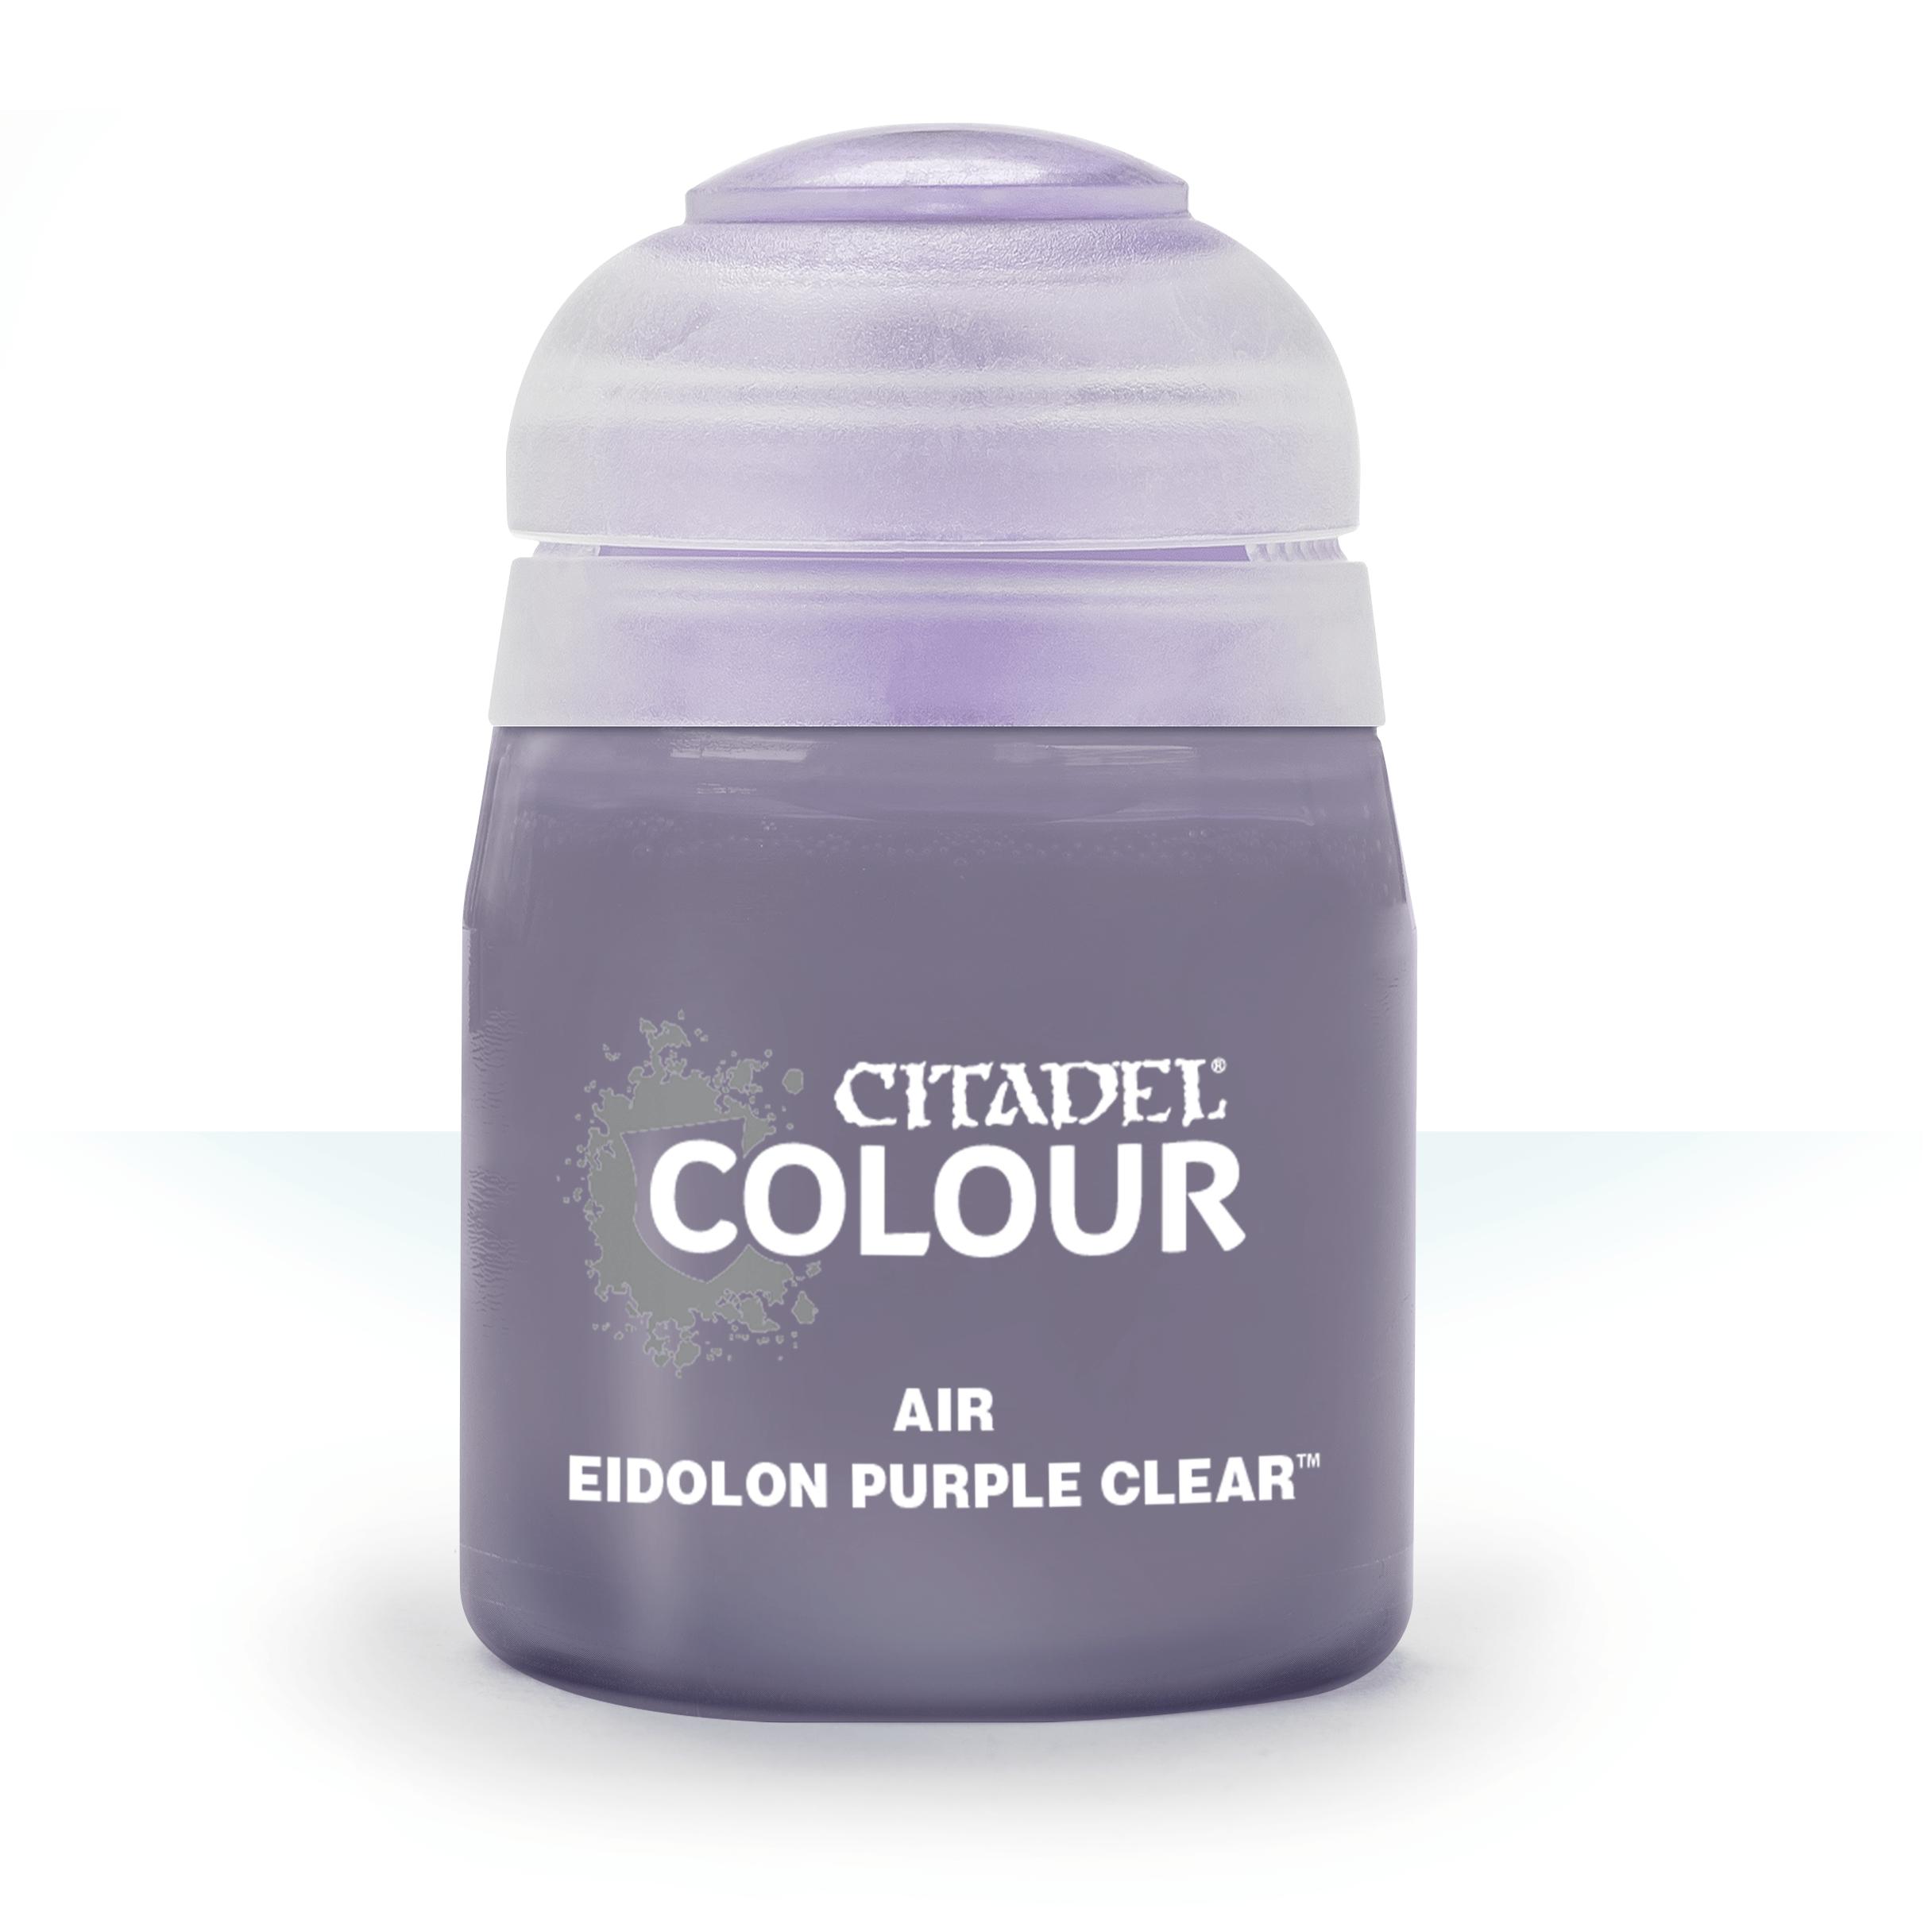 Eidolon Purple Clear, Citadel Air 24ml